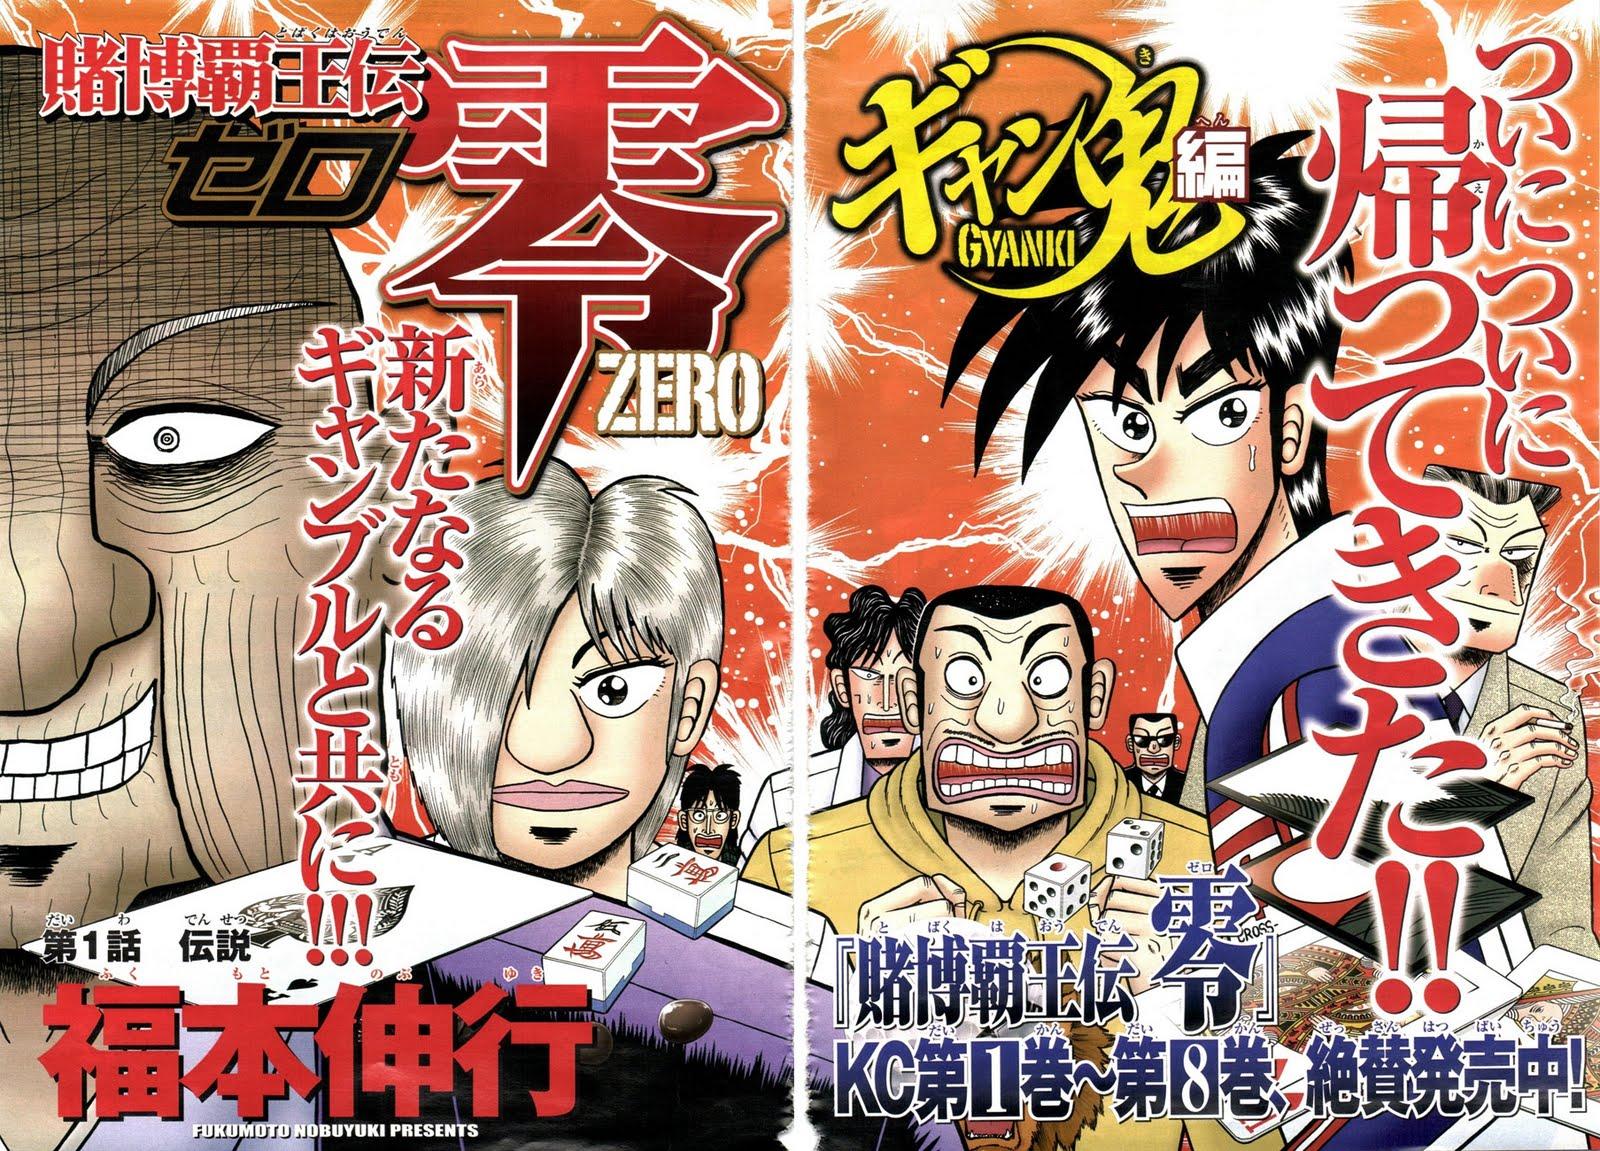 Tobaku Haouden Rei: Gyanki Hen Series